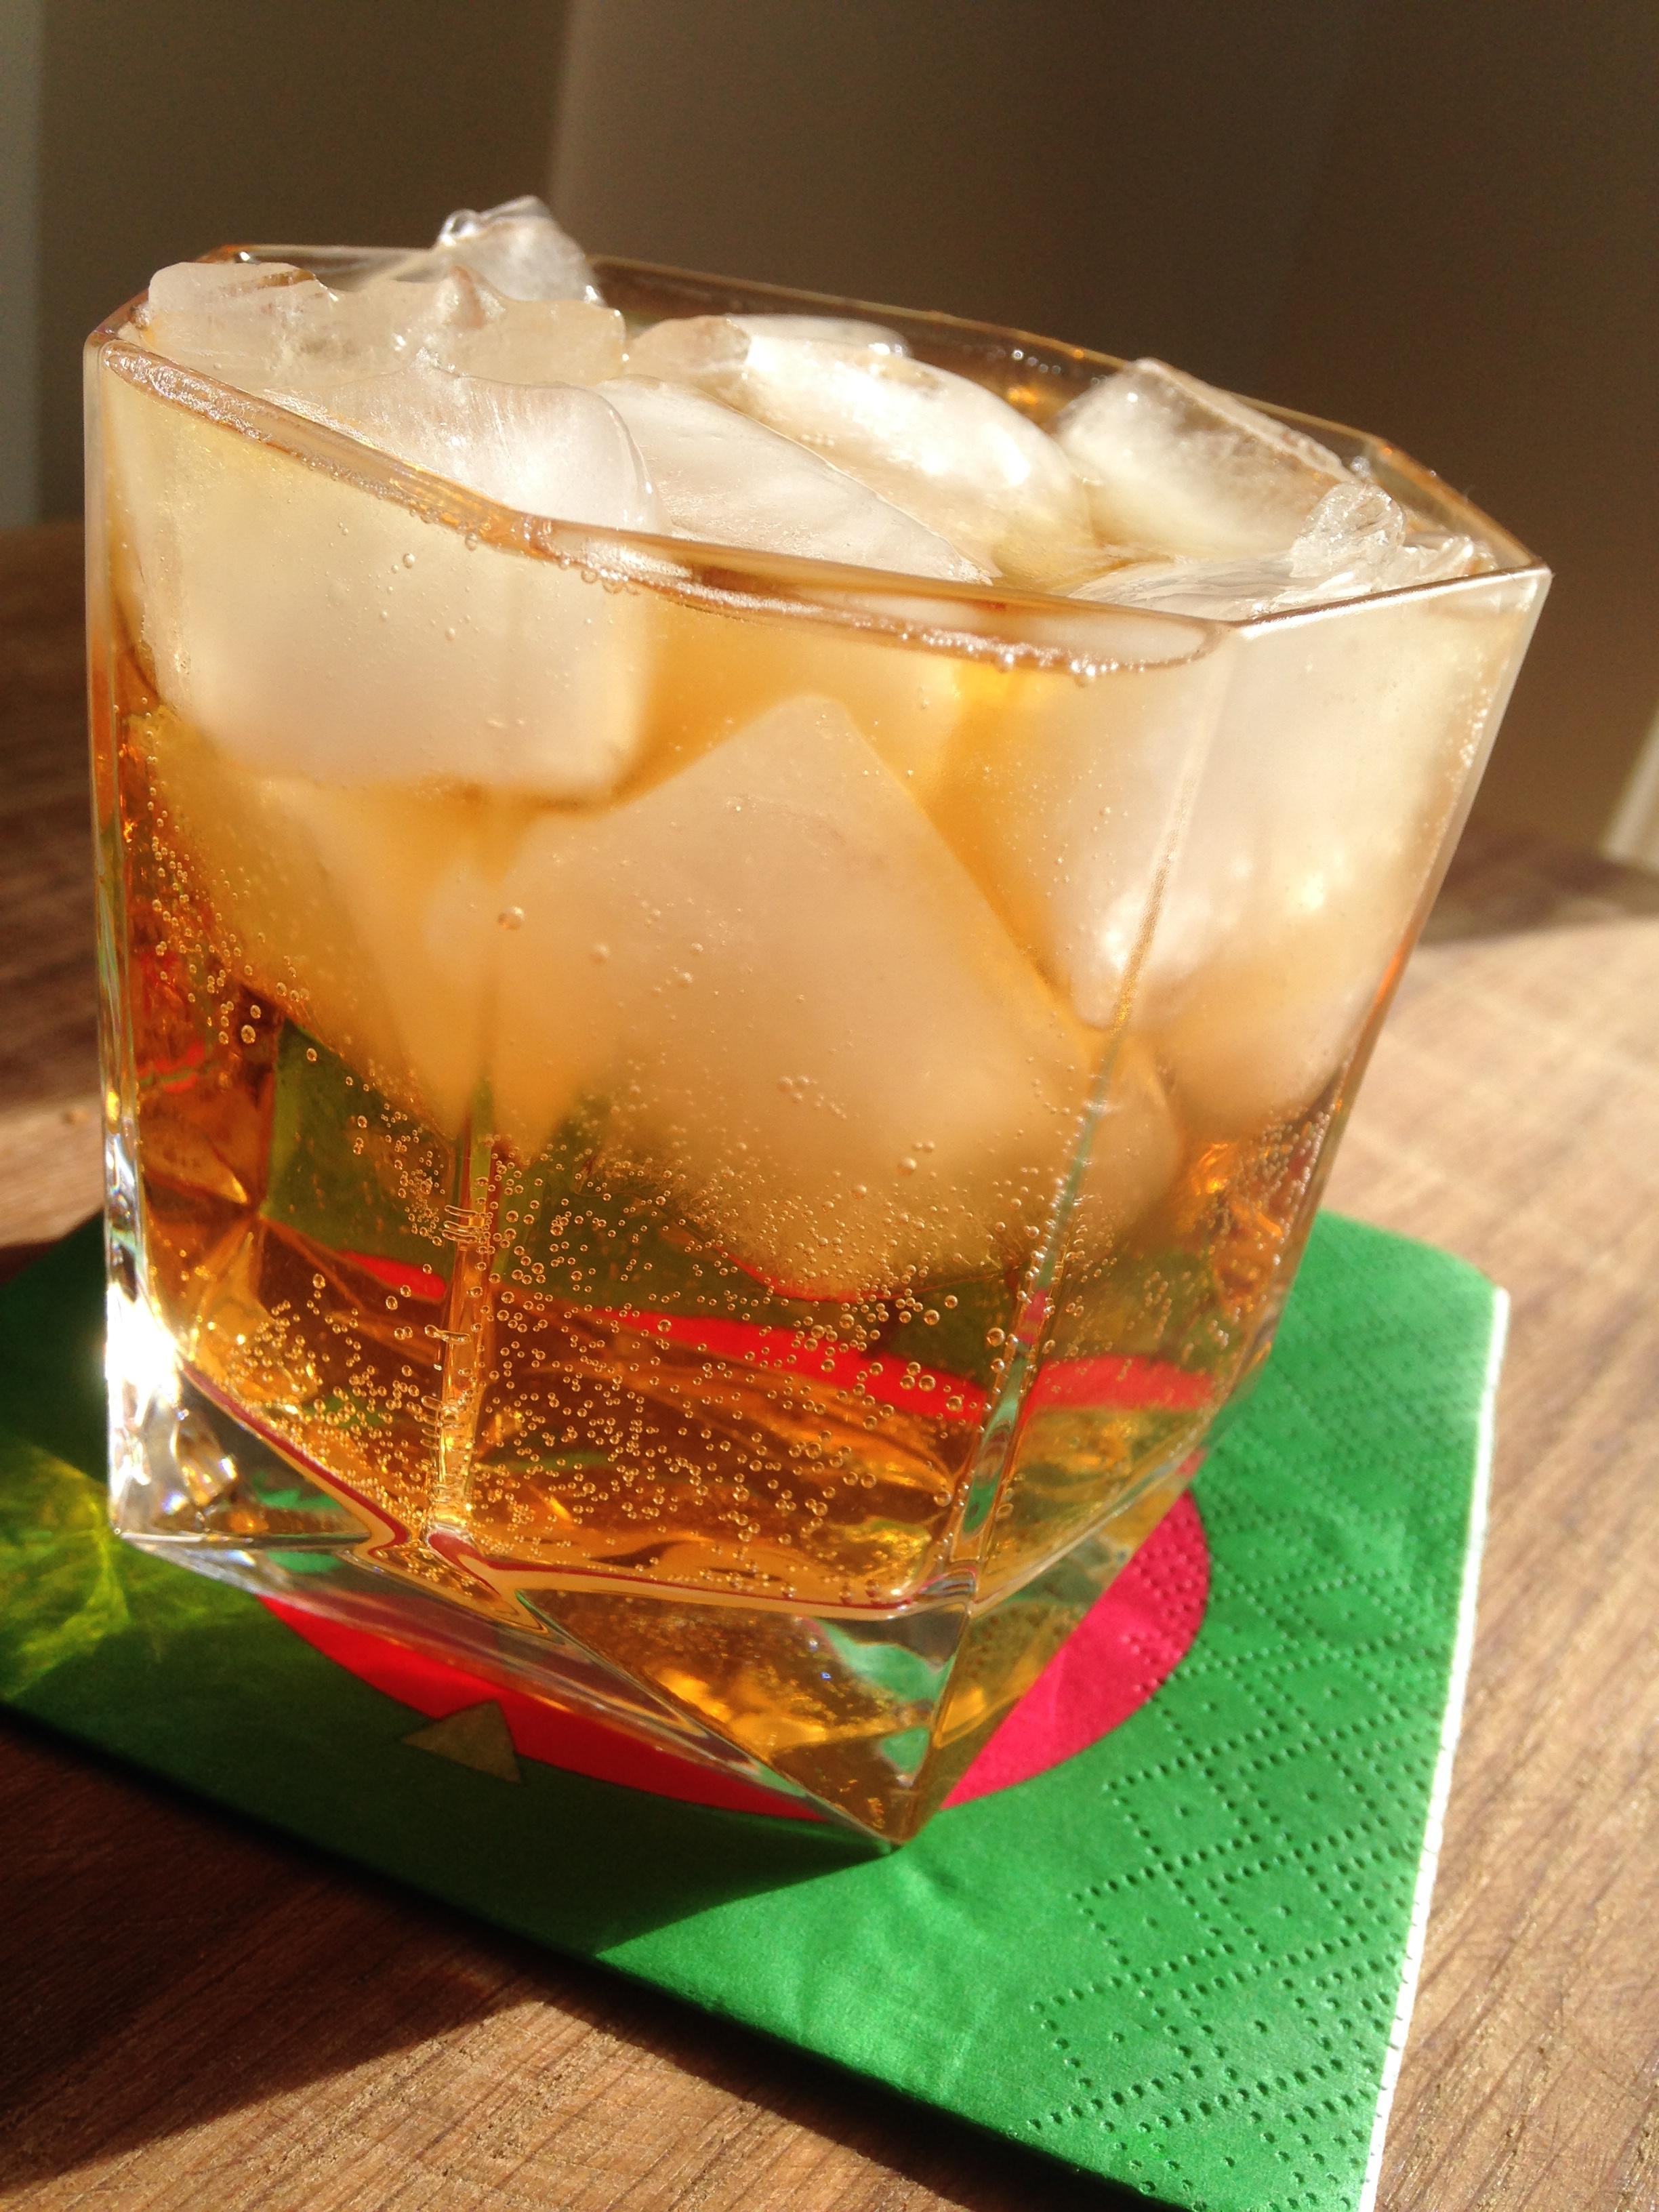 St. Patricks Day Cocktail – The Leprechaun's Blarney